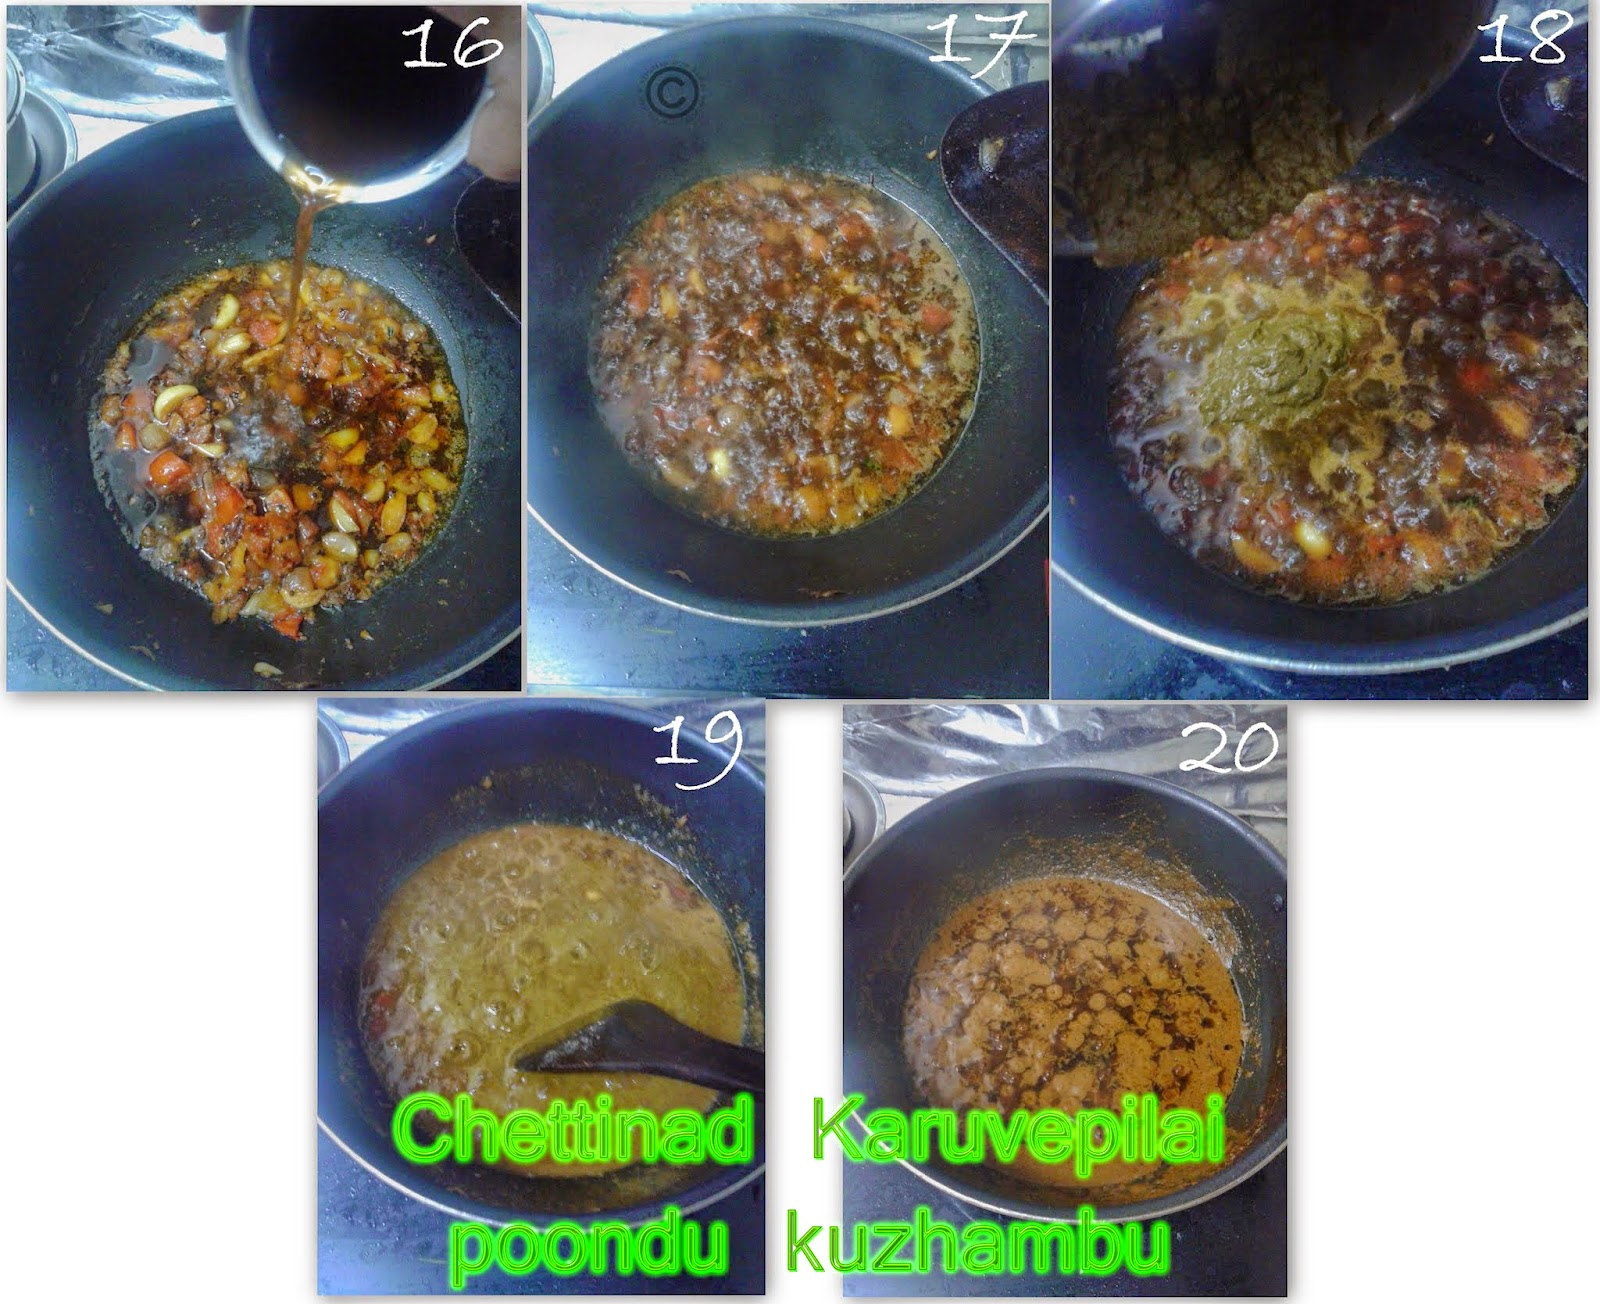 chettinad-poondu-kuzhambu